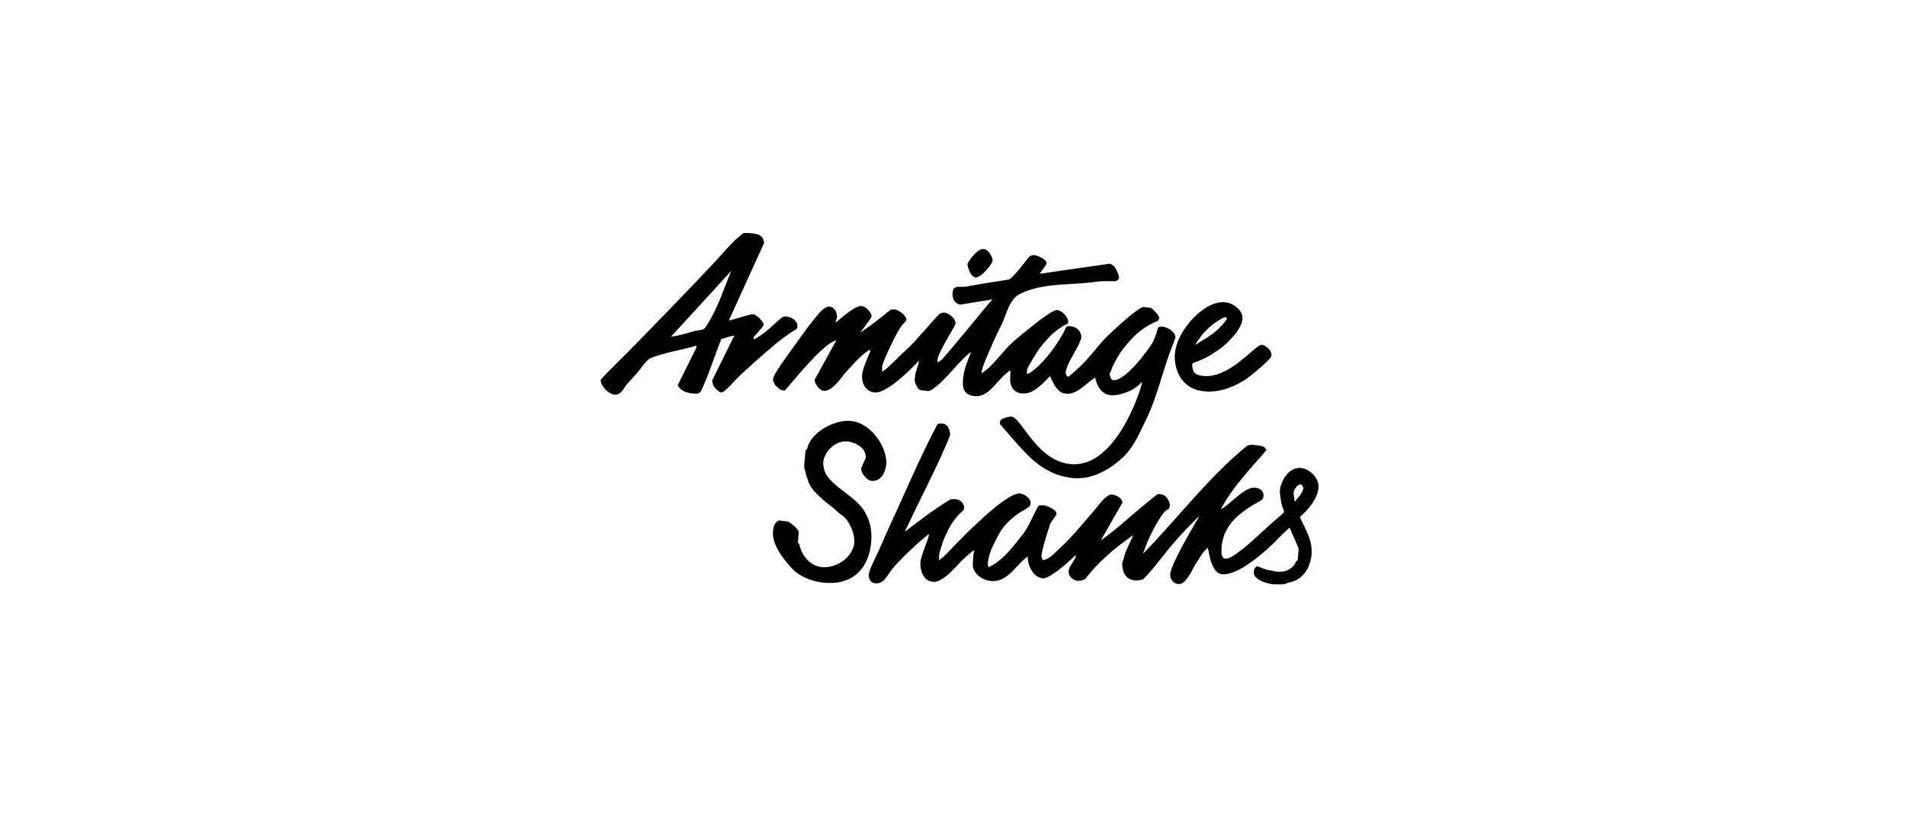 Armitage shanks